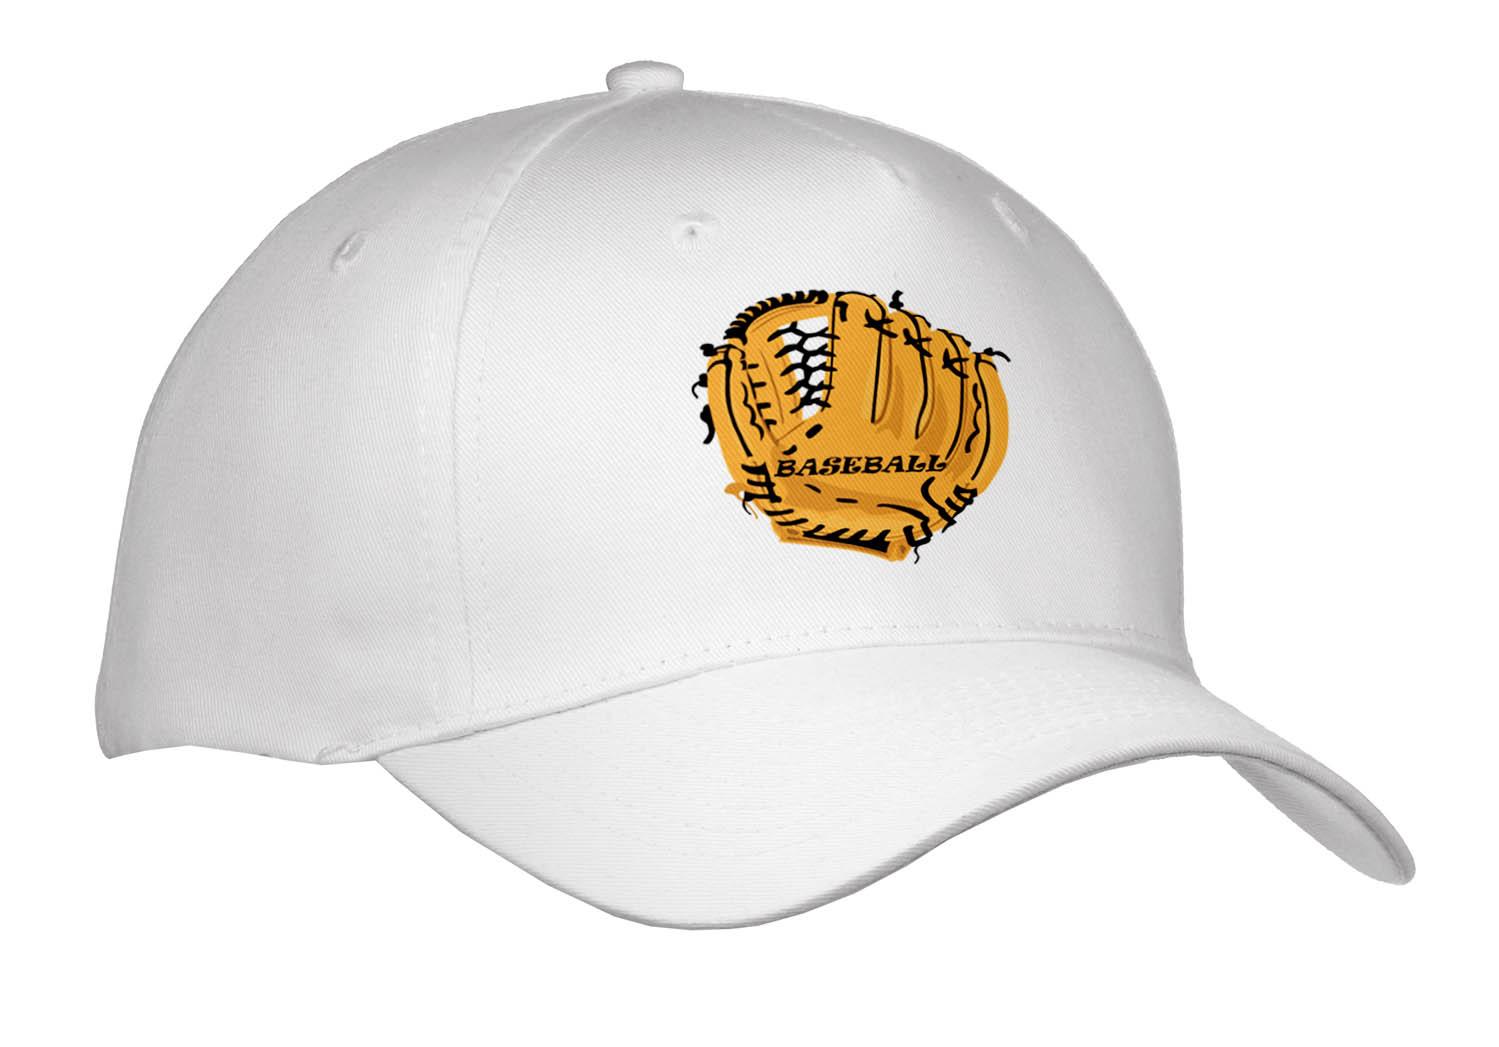 3dRose - Florene Sports - Large Baseball Mitt With Word Baseball - Caps